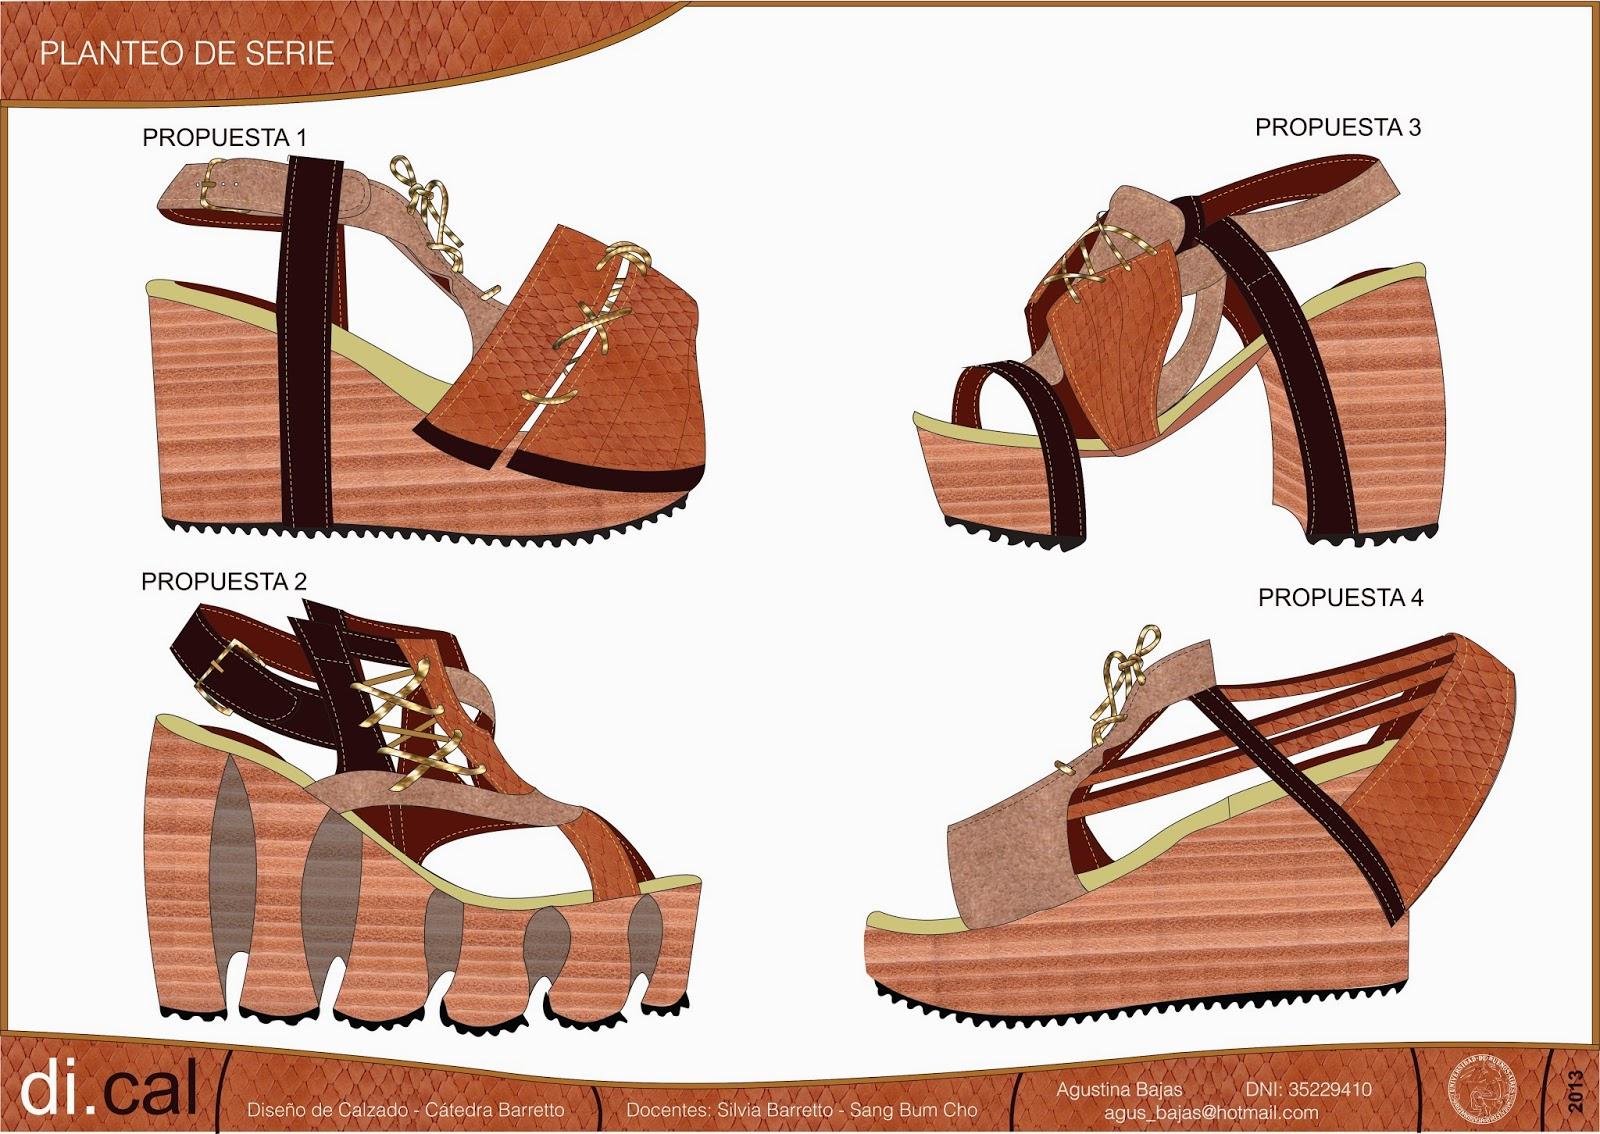 Tp dise o de calzado agustina bajas porfolio for Diseno de zapatos